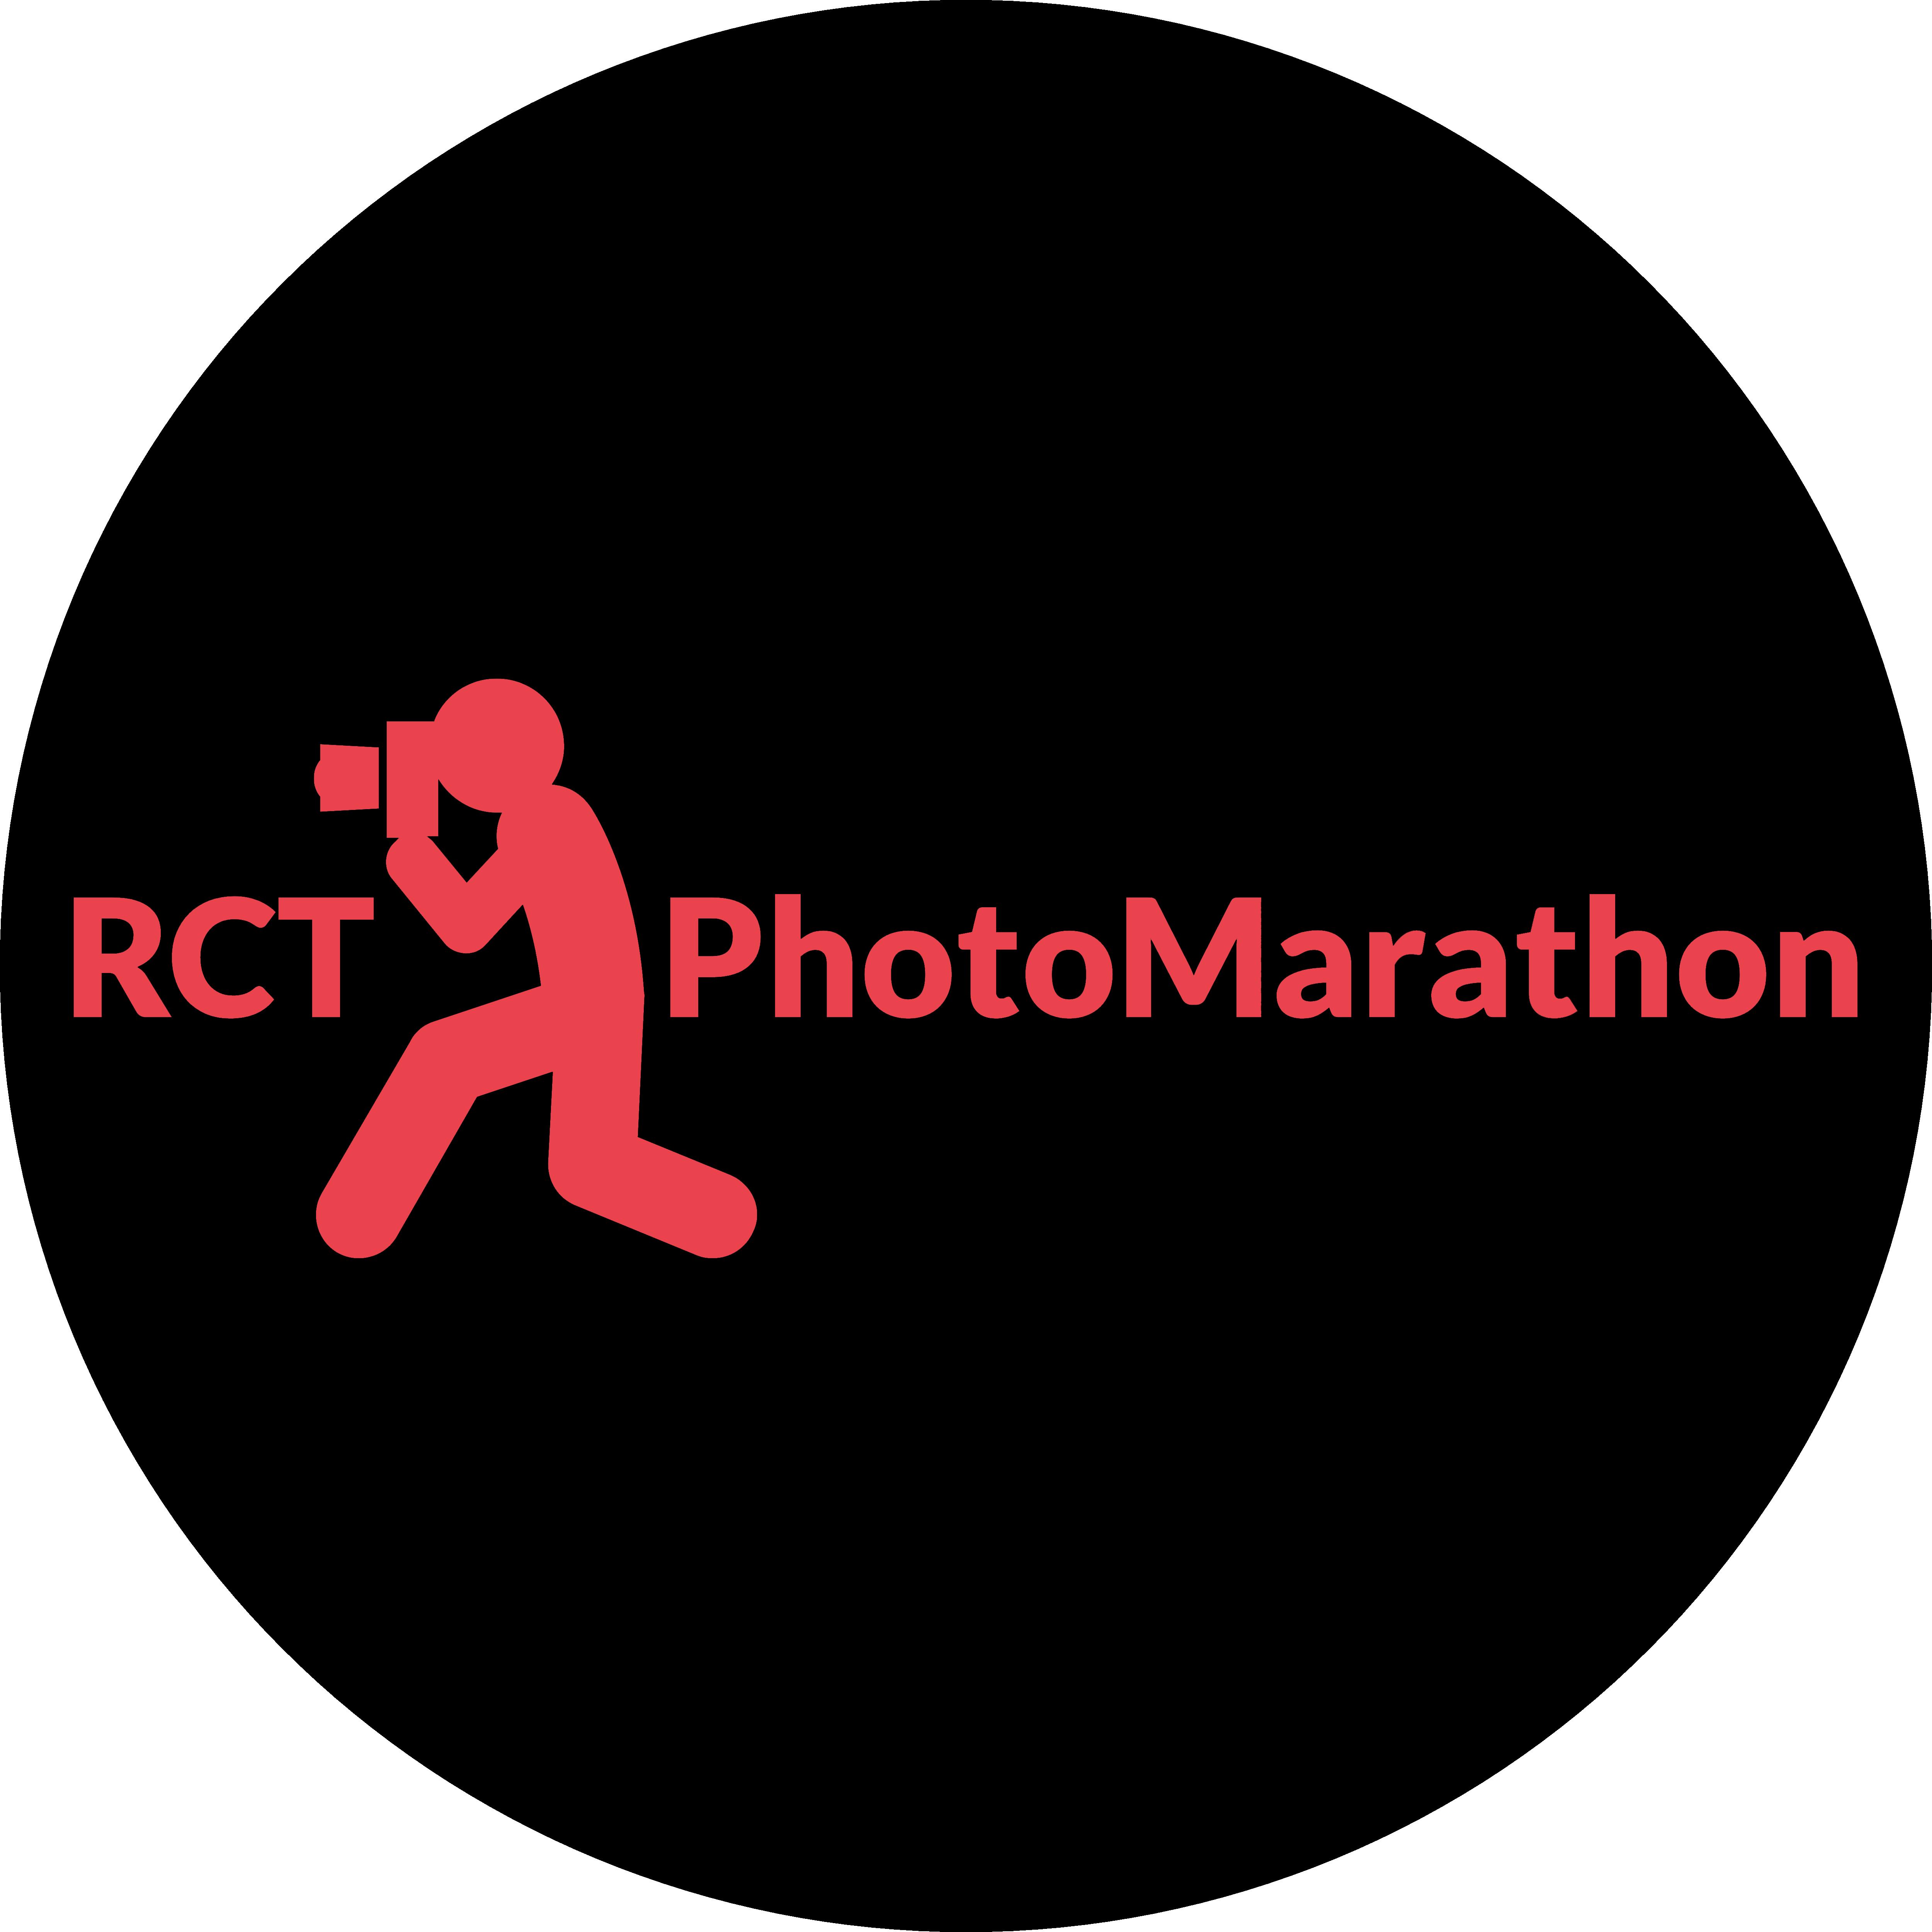 rctphotomarathon